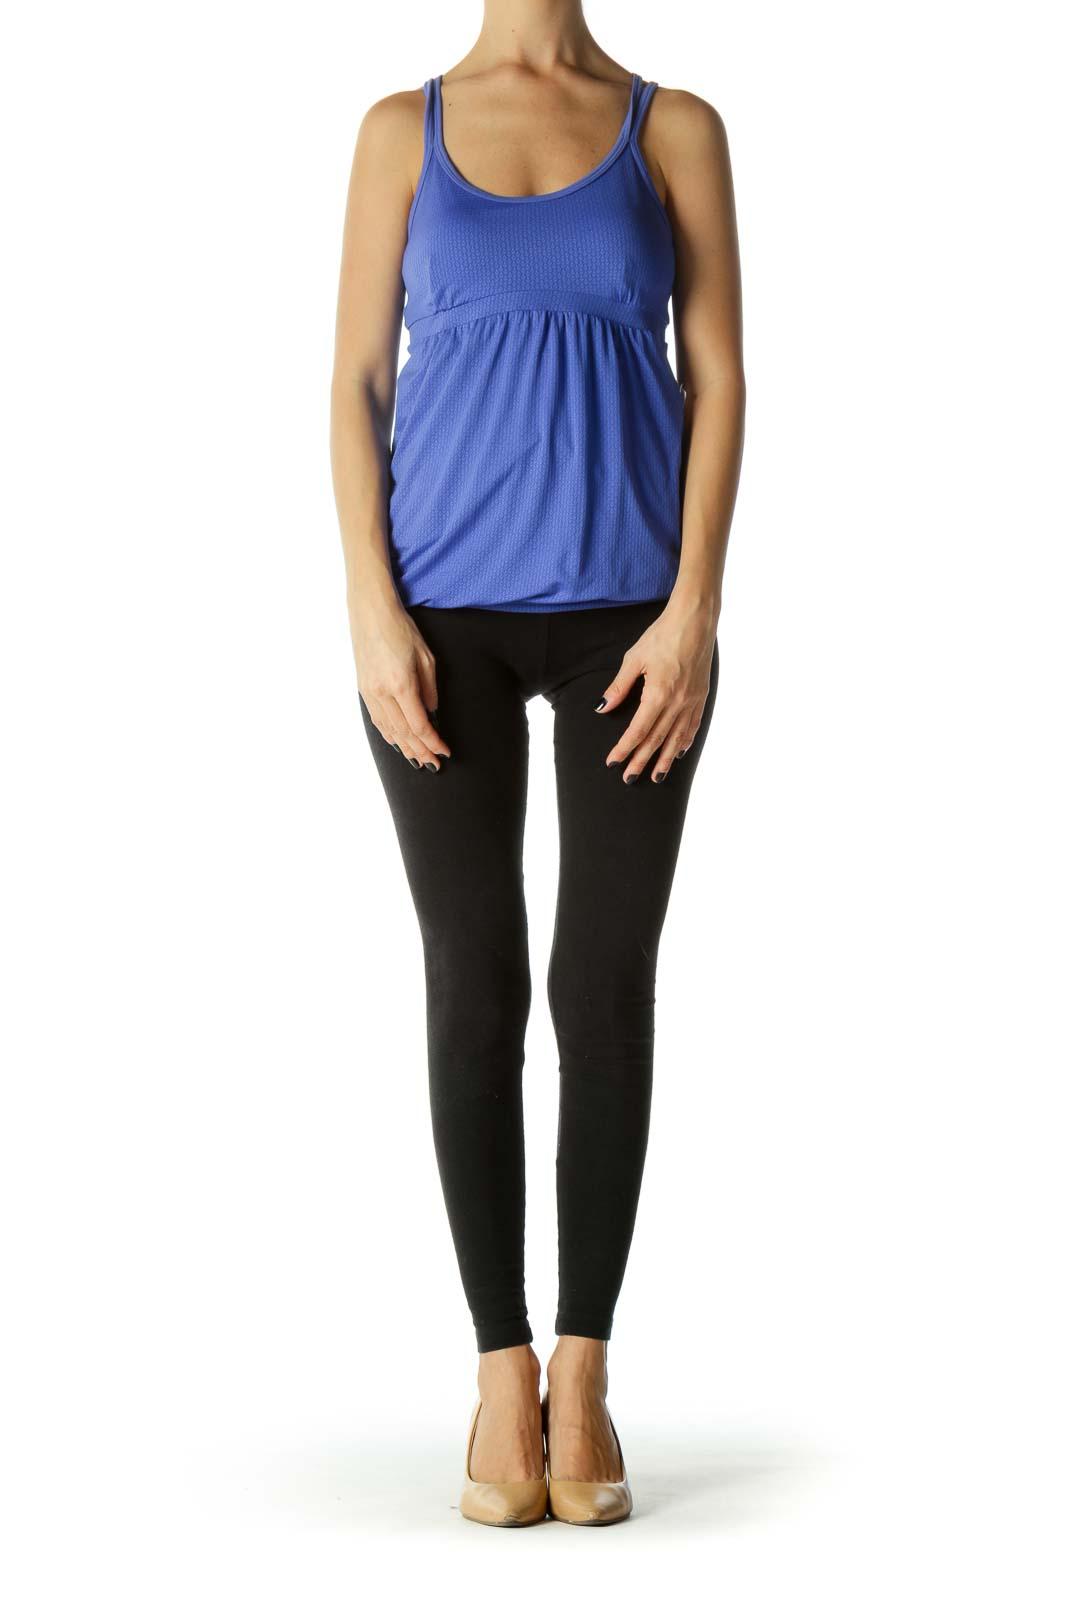 Blue Patterned Crisscross Back Yoga Top